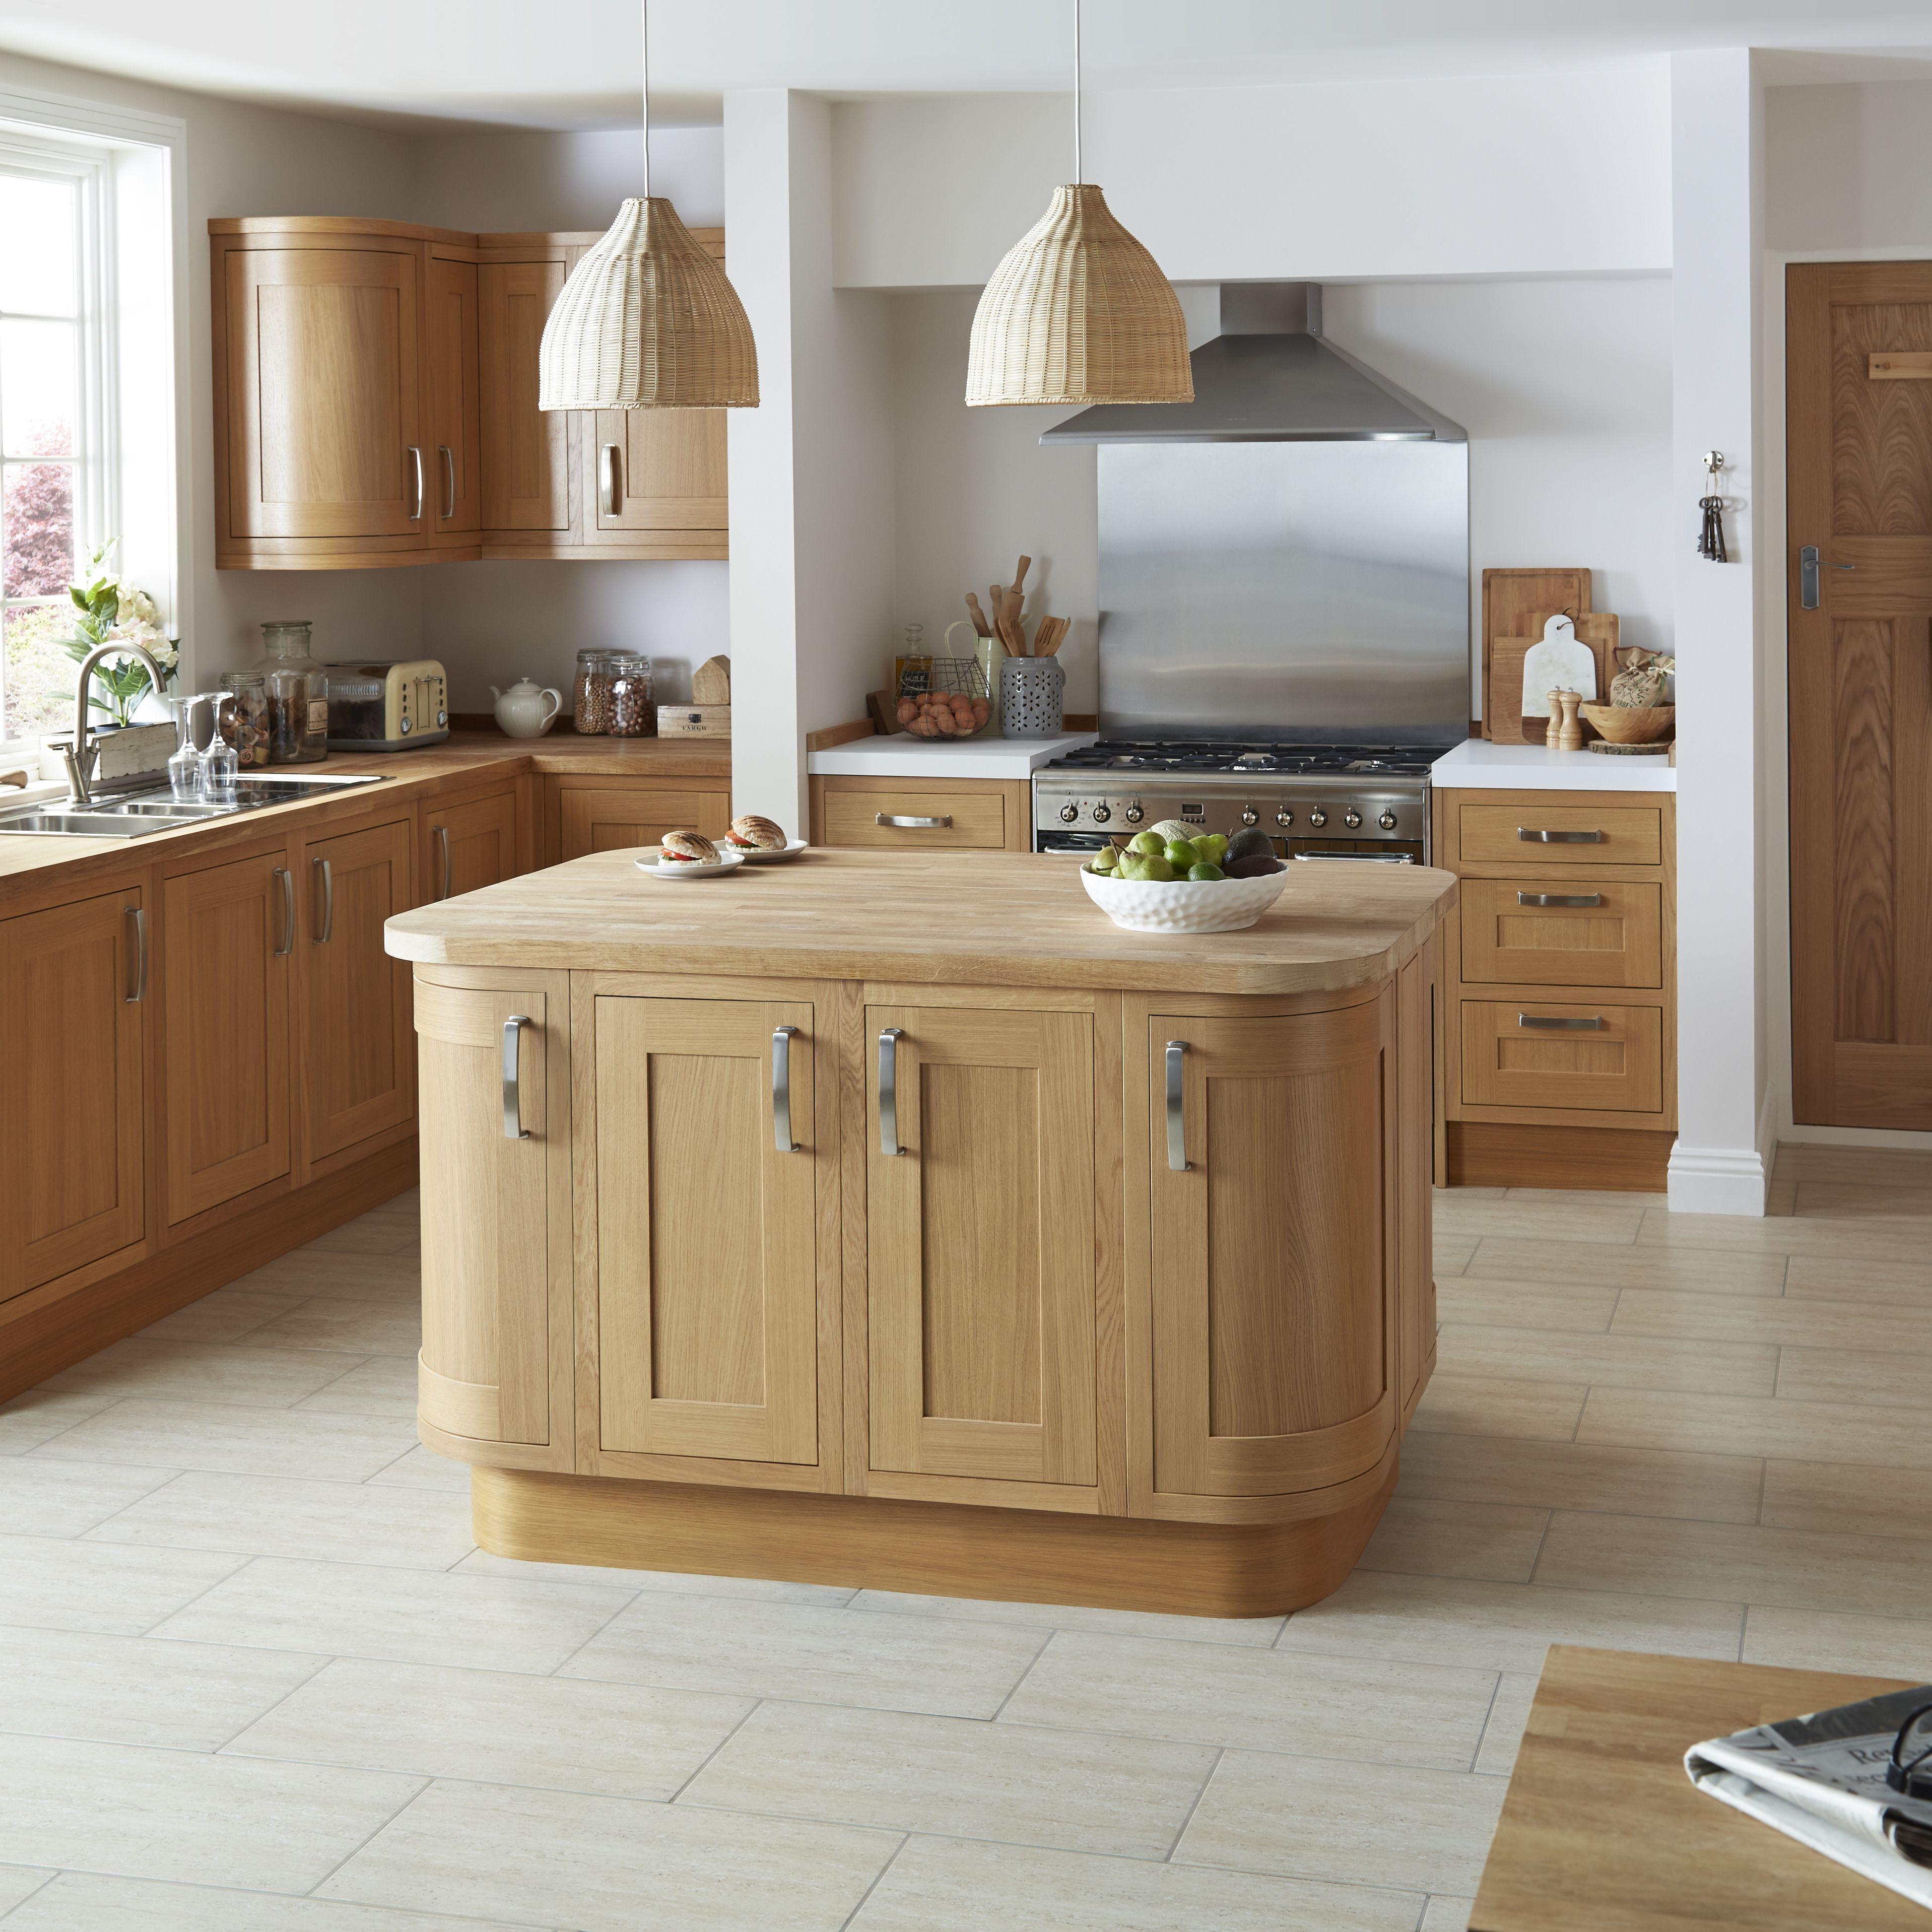 Cooke & Lewis Kitchens Natural Oak Effect Straight Plinth (L)3050mm